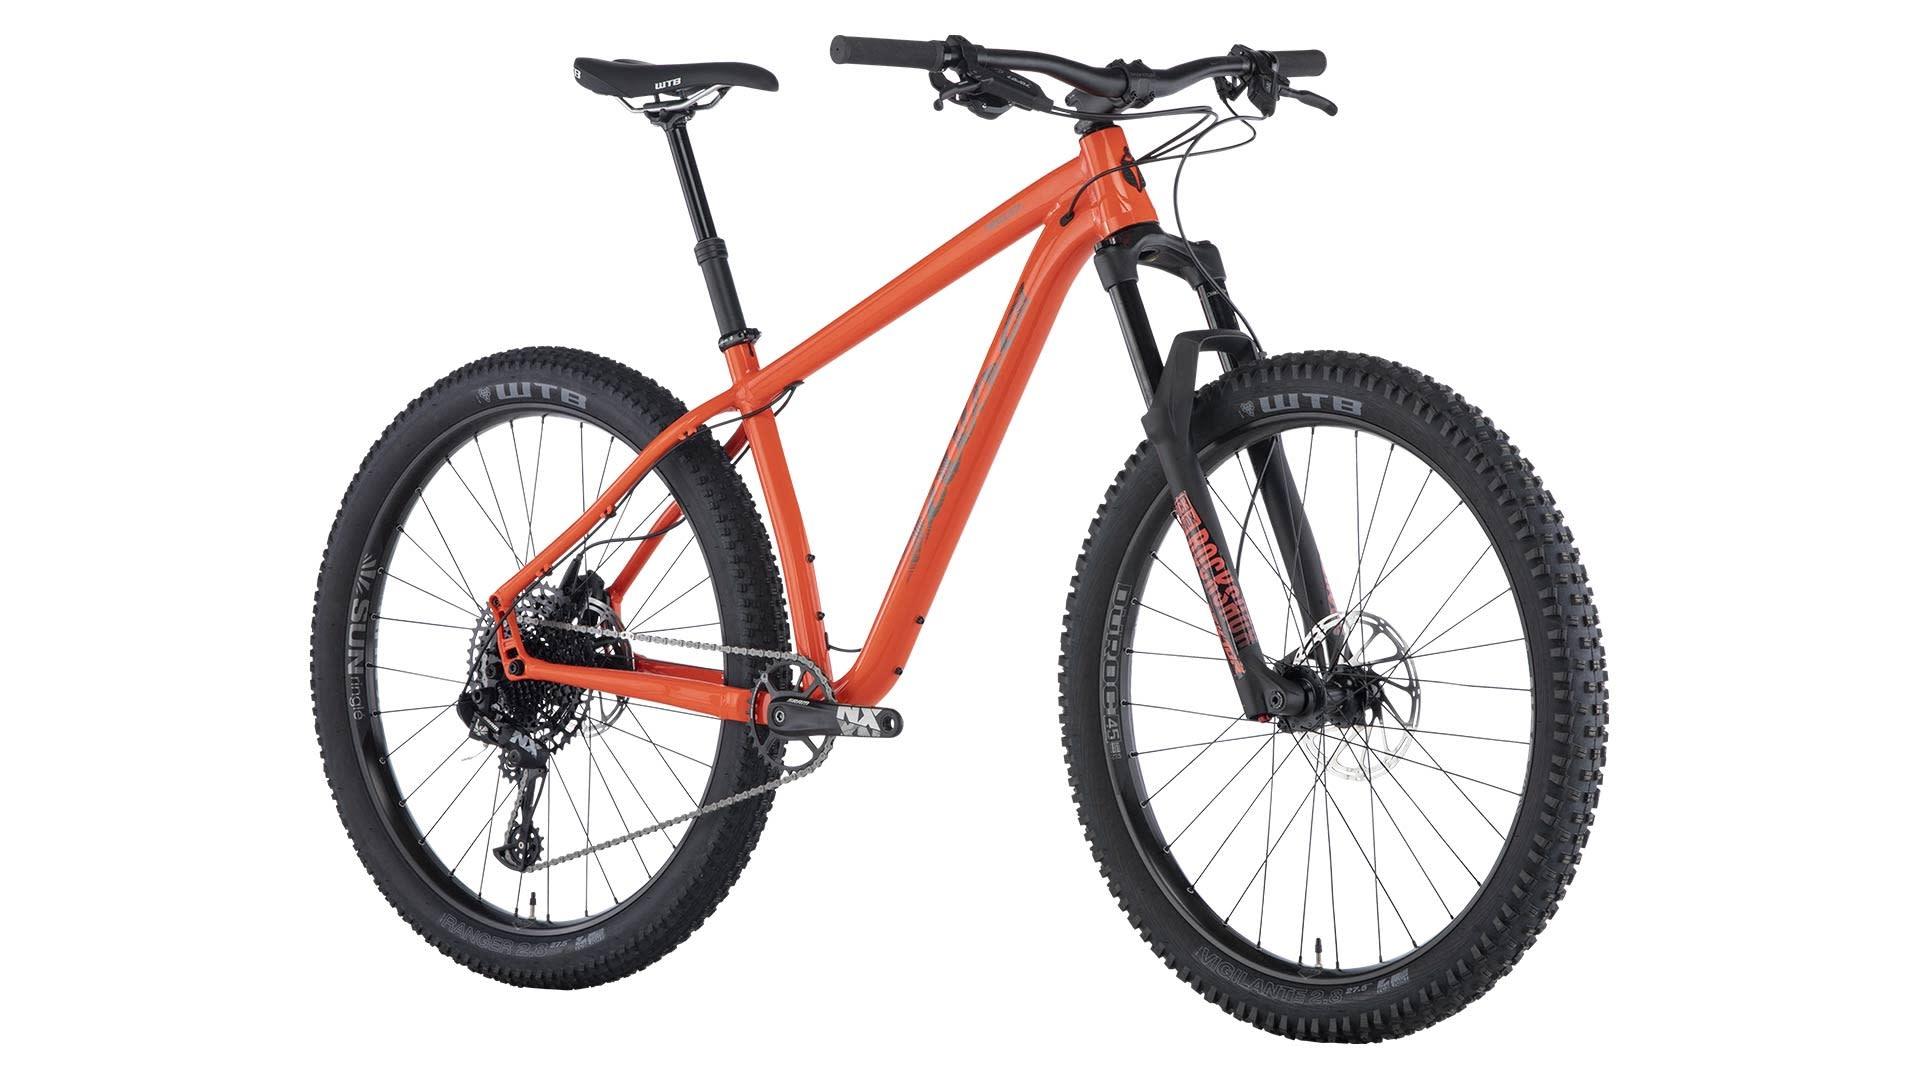 Salsa Salsa Timberjack NX Eagle 27.5+ Bike Red/Orange 2019